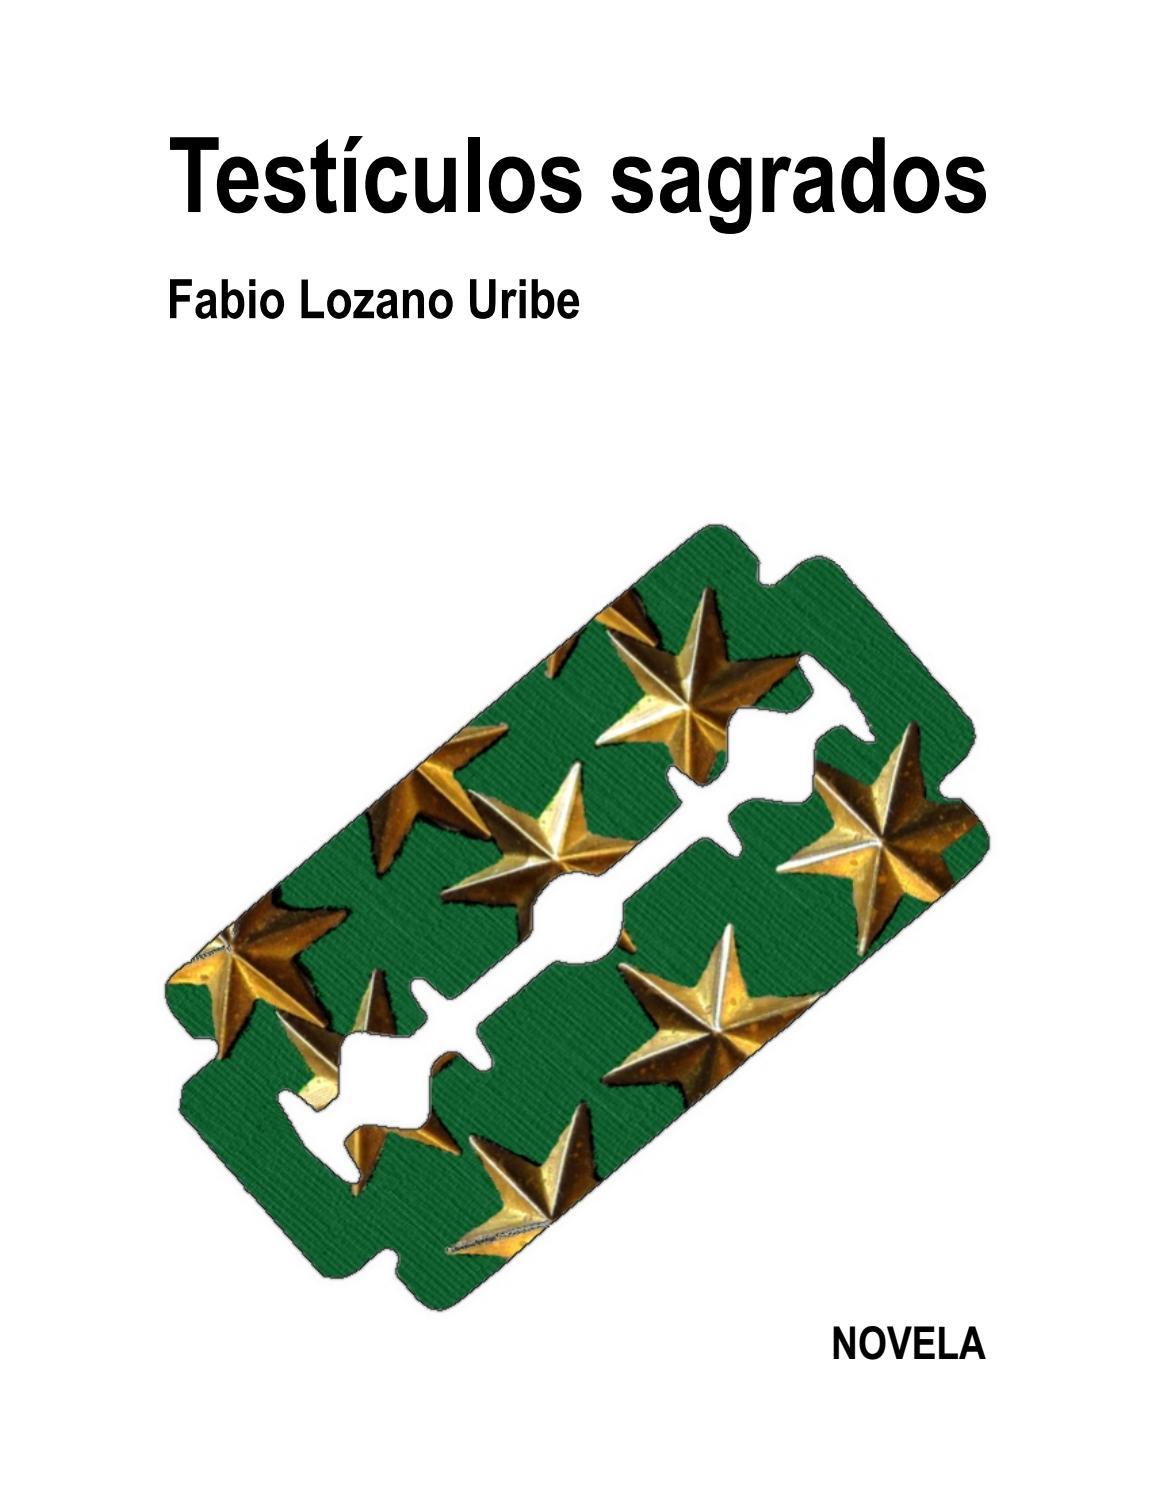 dab691e80e Testículos Sagrados by Fabio Lozano Uribe - issuu